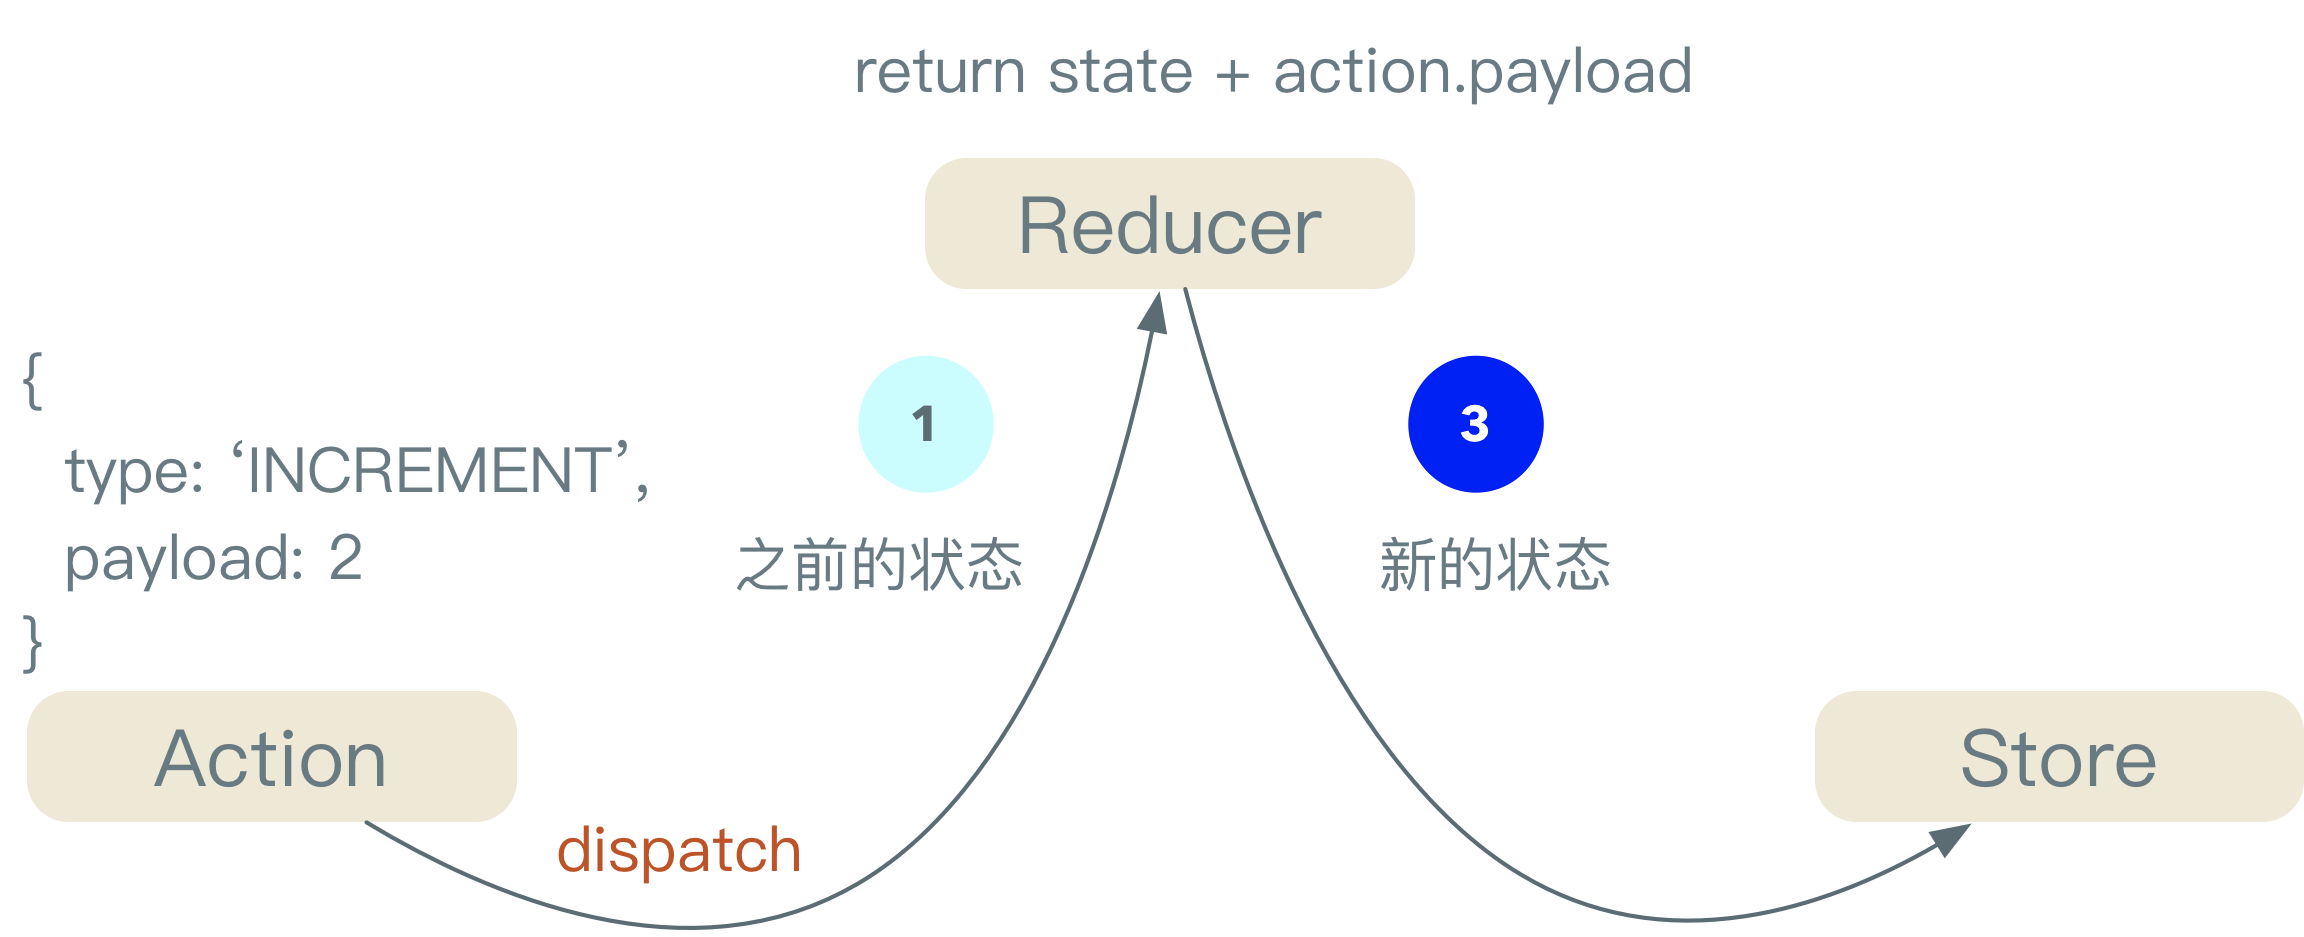 显性定义的Action触发Reducer产生新的状态